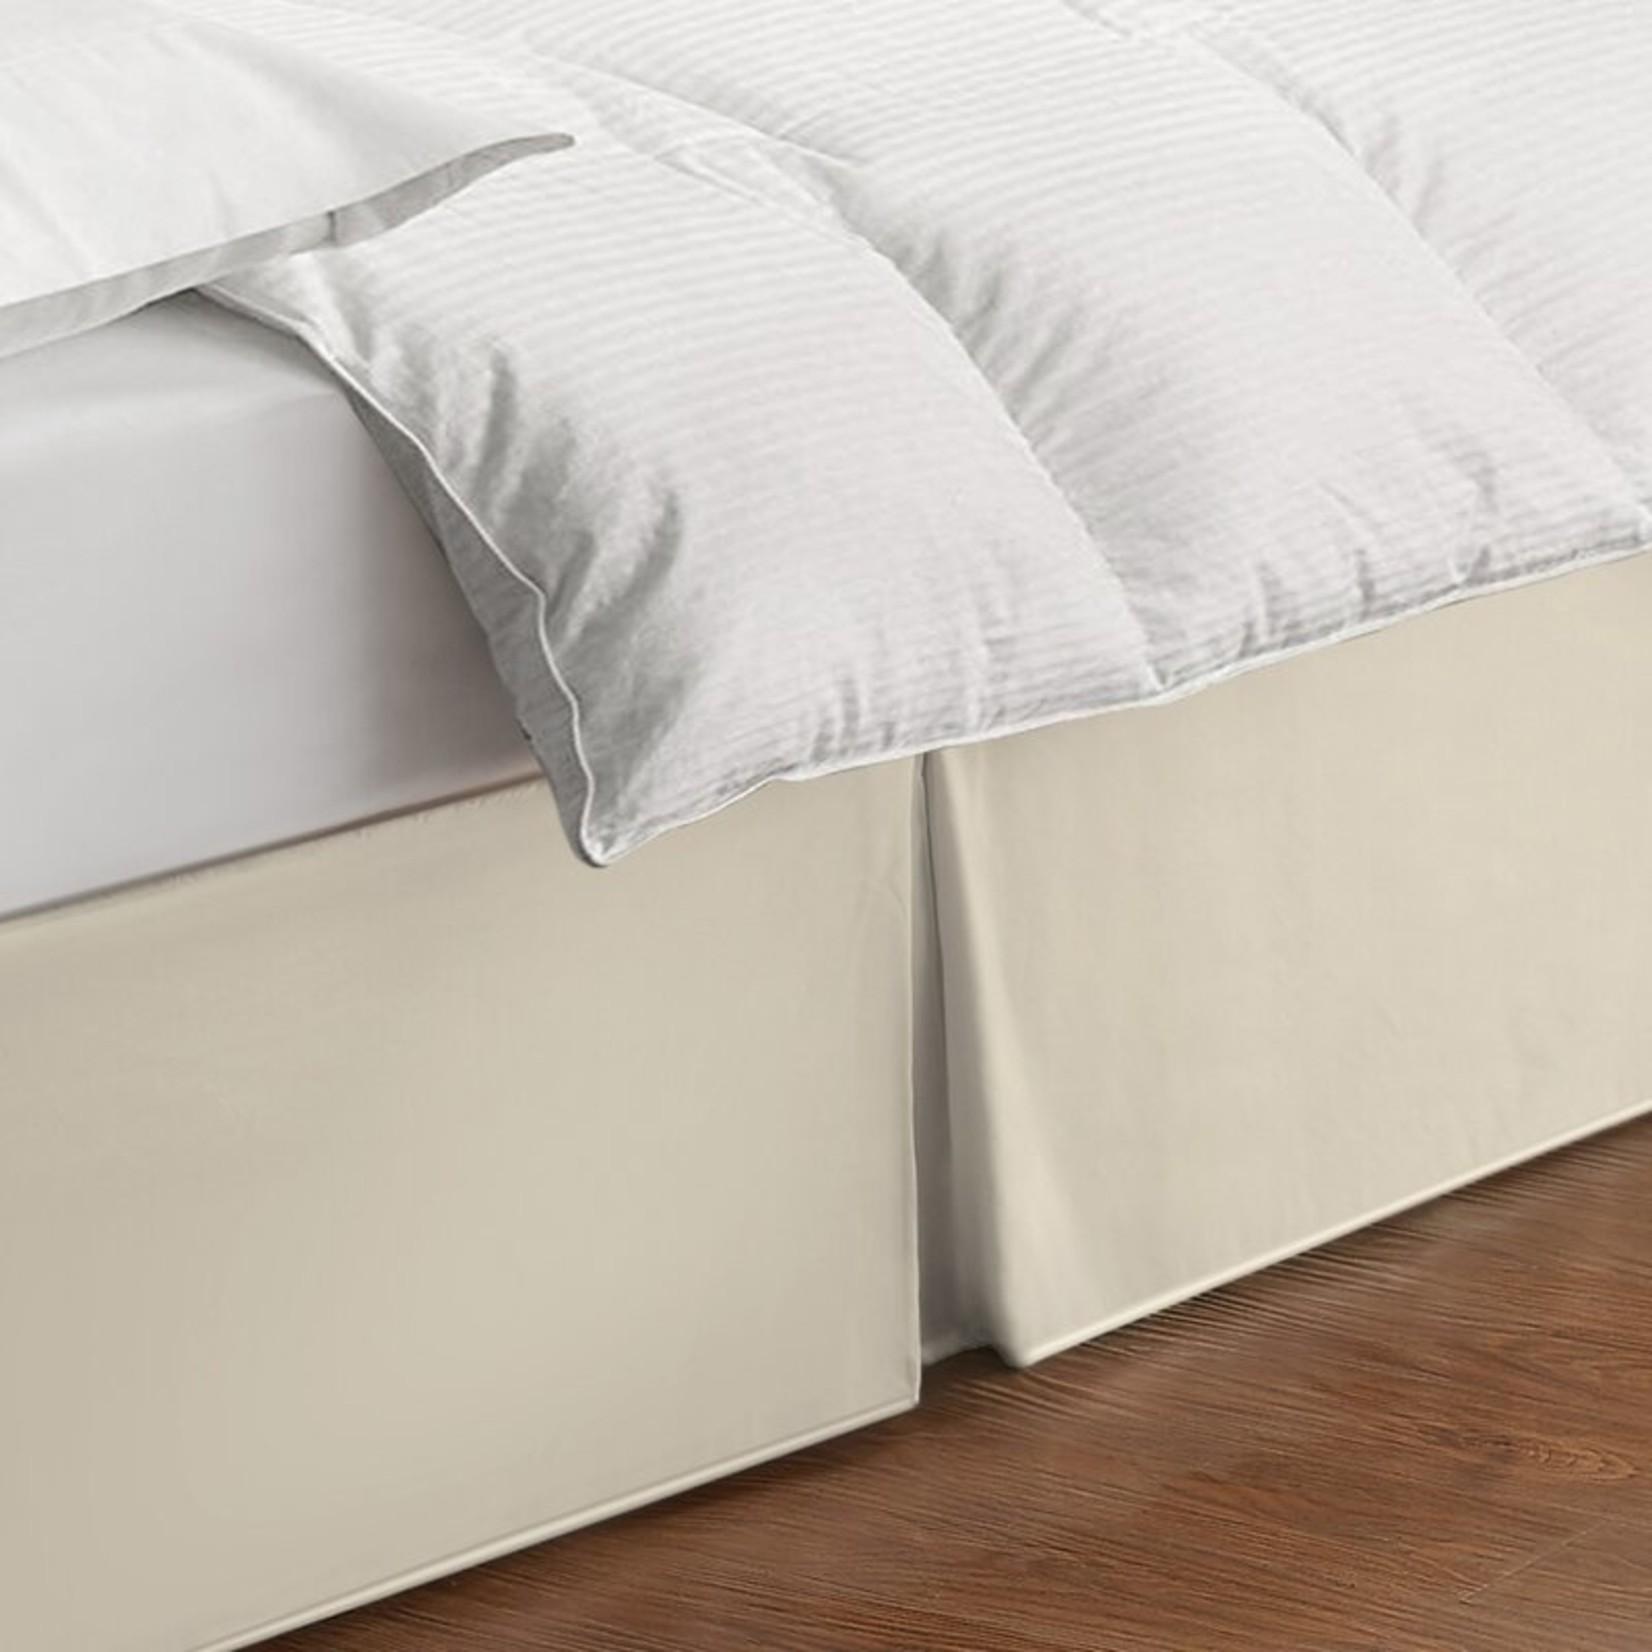 "* King - Rolande Wraparound Tailored 14"" Bed Skirt - Ivory - Final Sale"